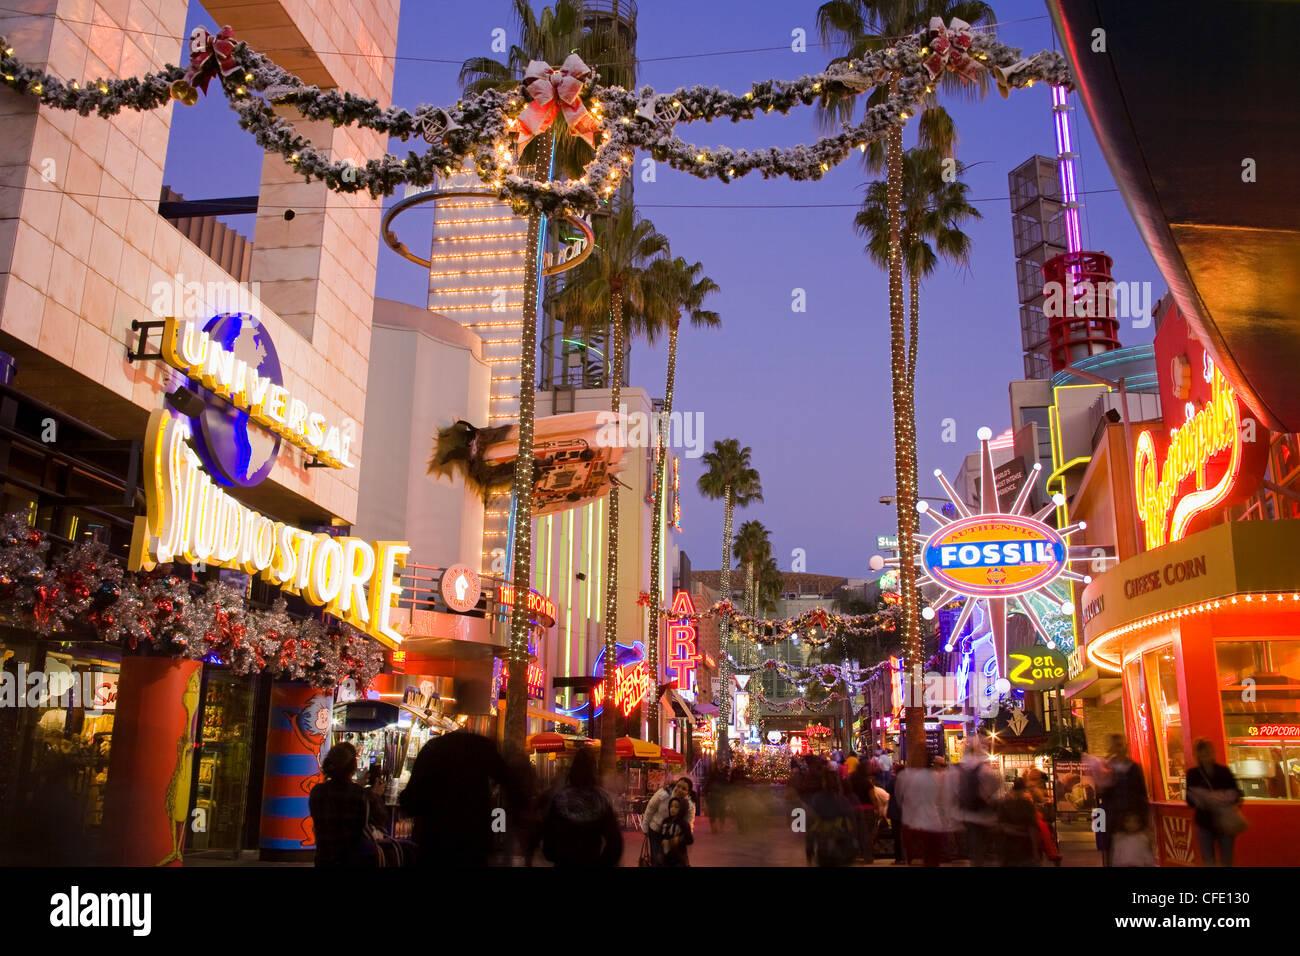 Citywalk Mall At Universal Studios Hollywood In Los